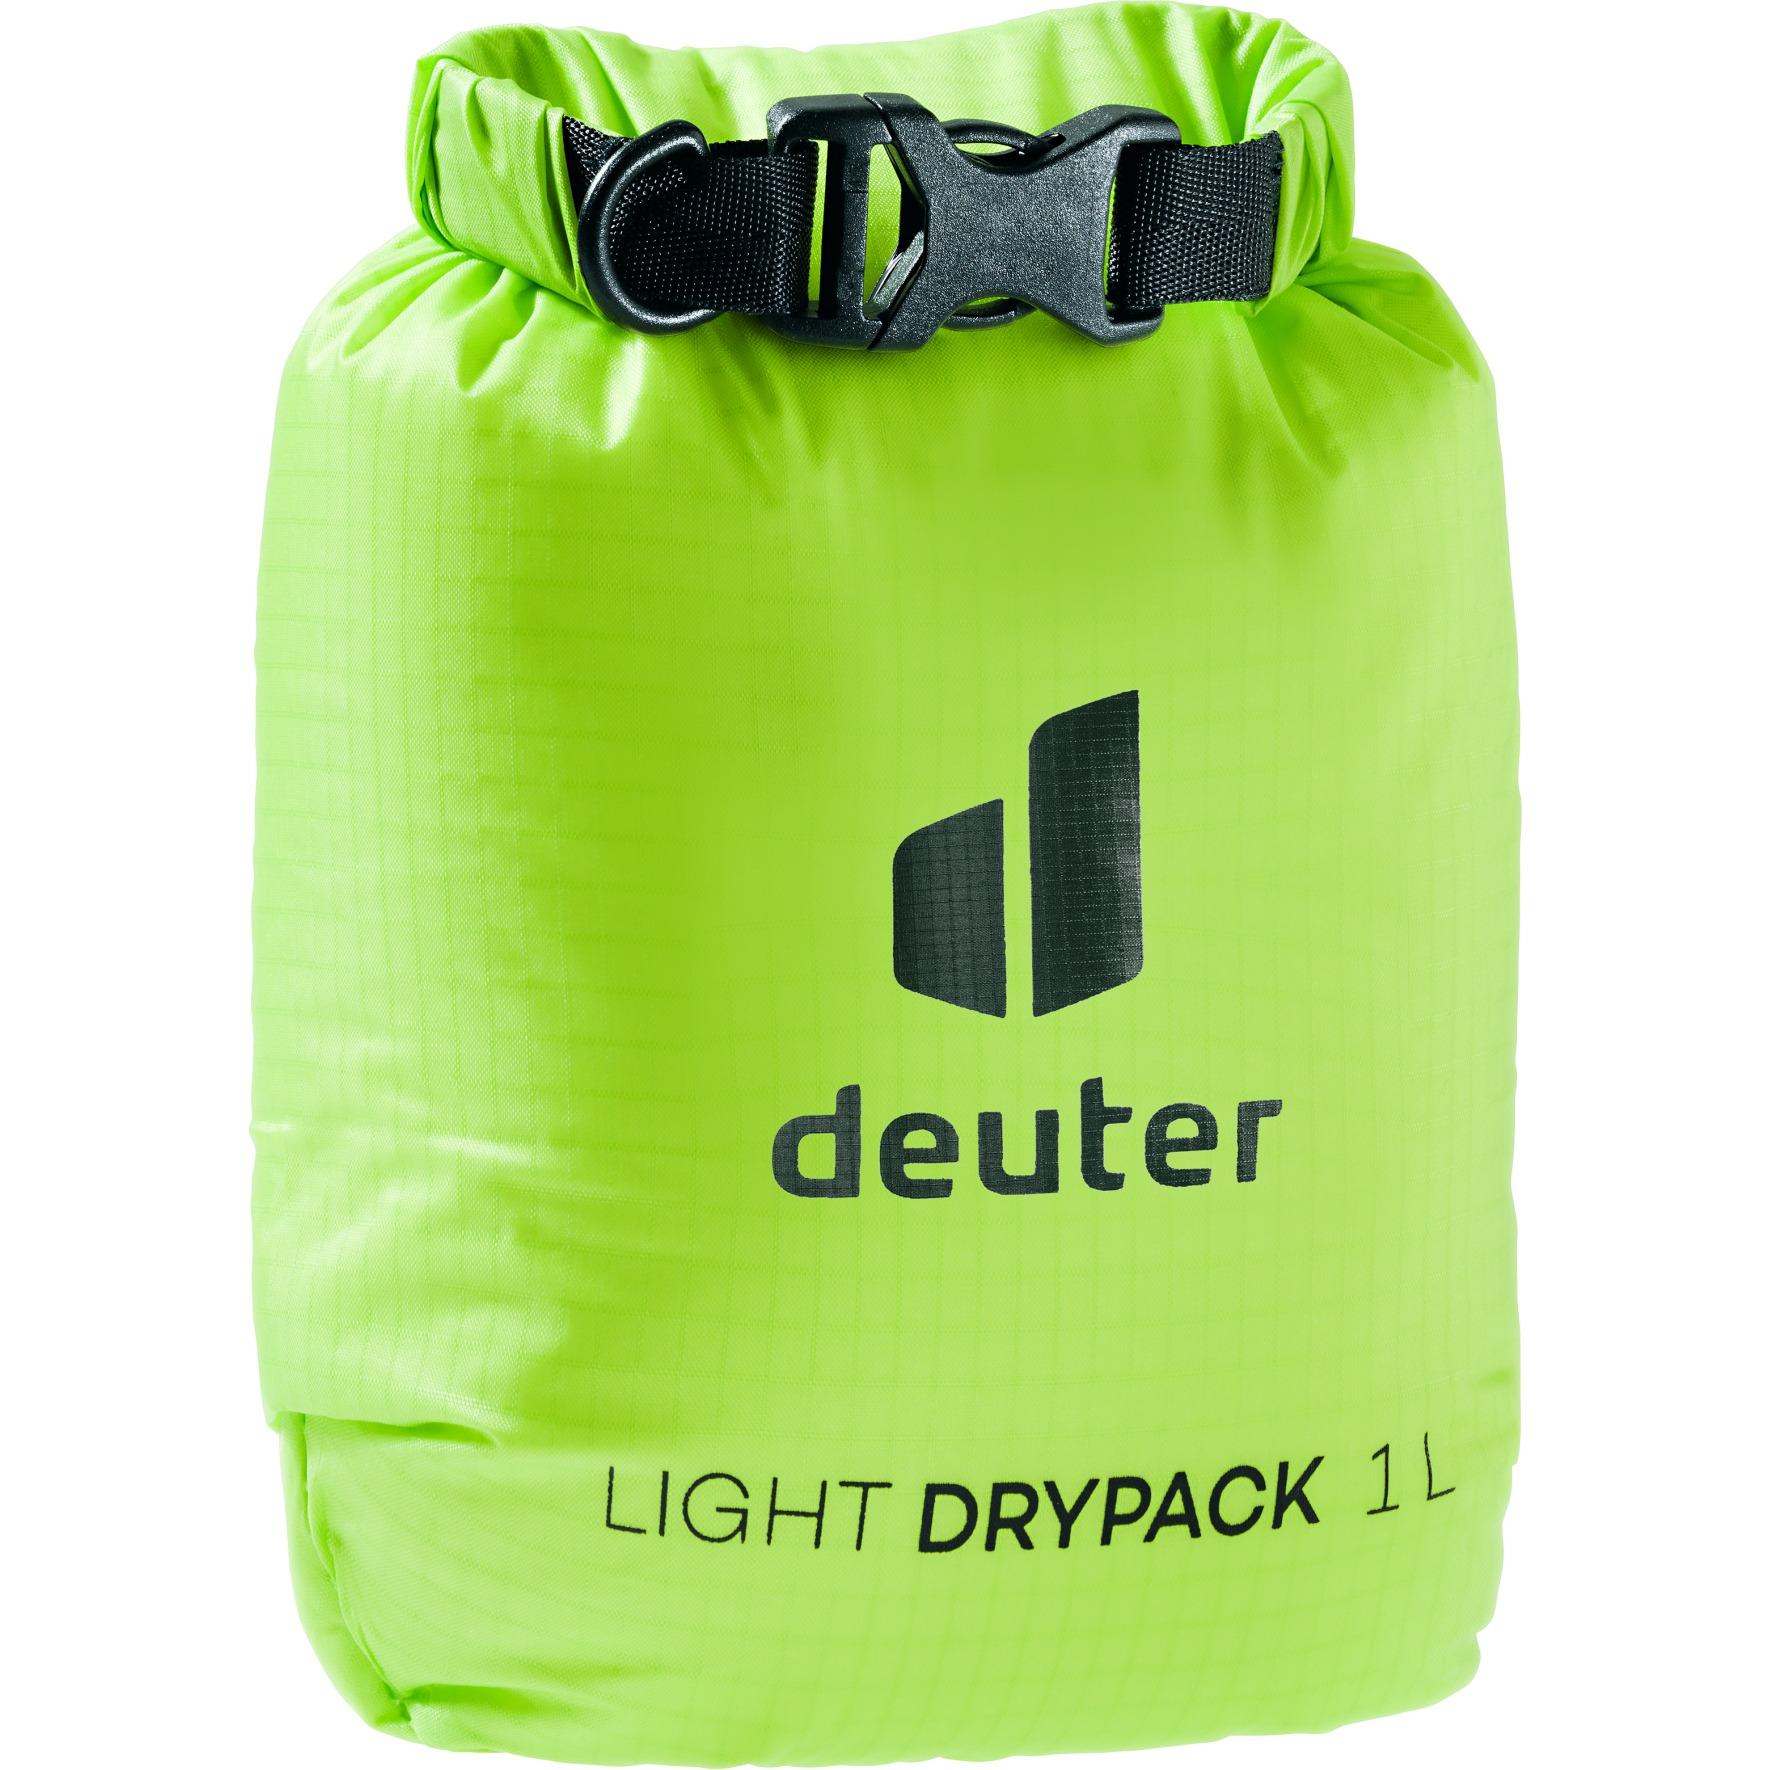 Deuter Light Drypack 1l - citrus